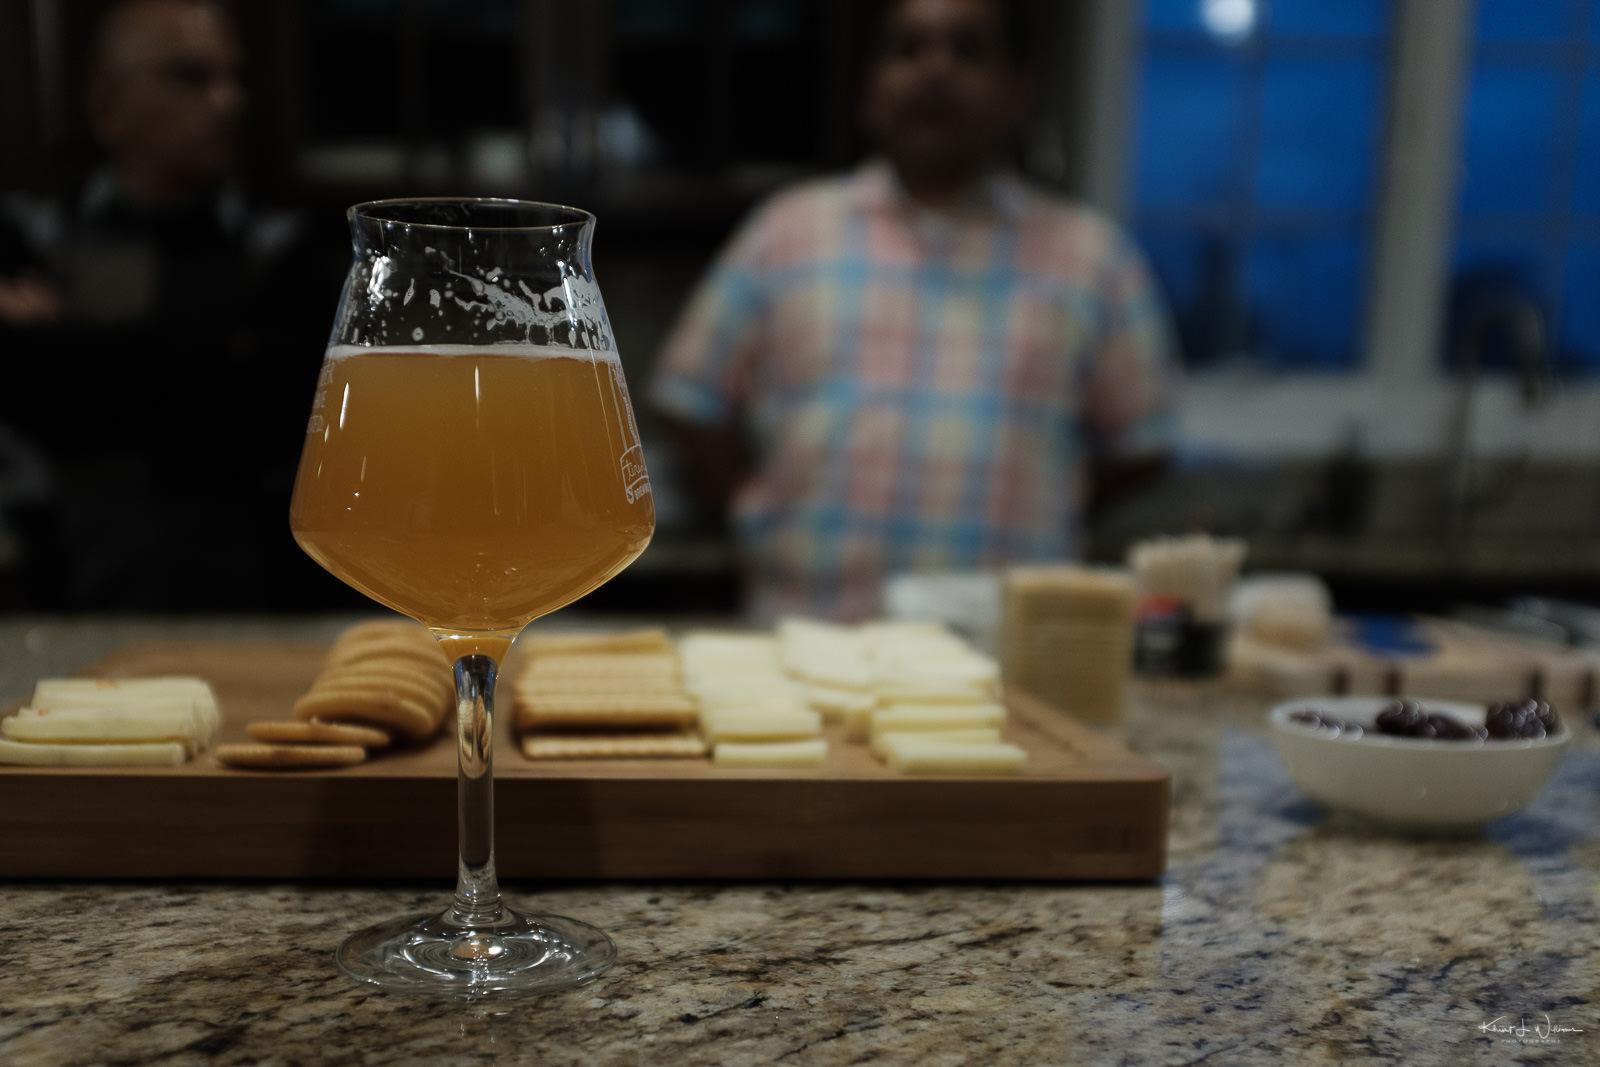 Bolero Snort Brewery's The Last Bovine